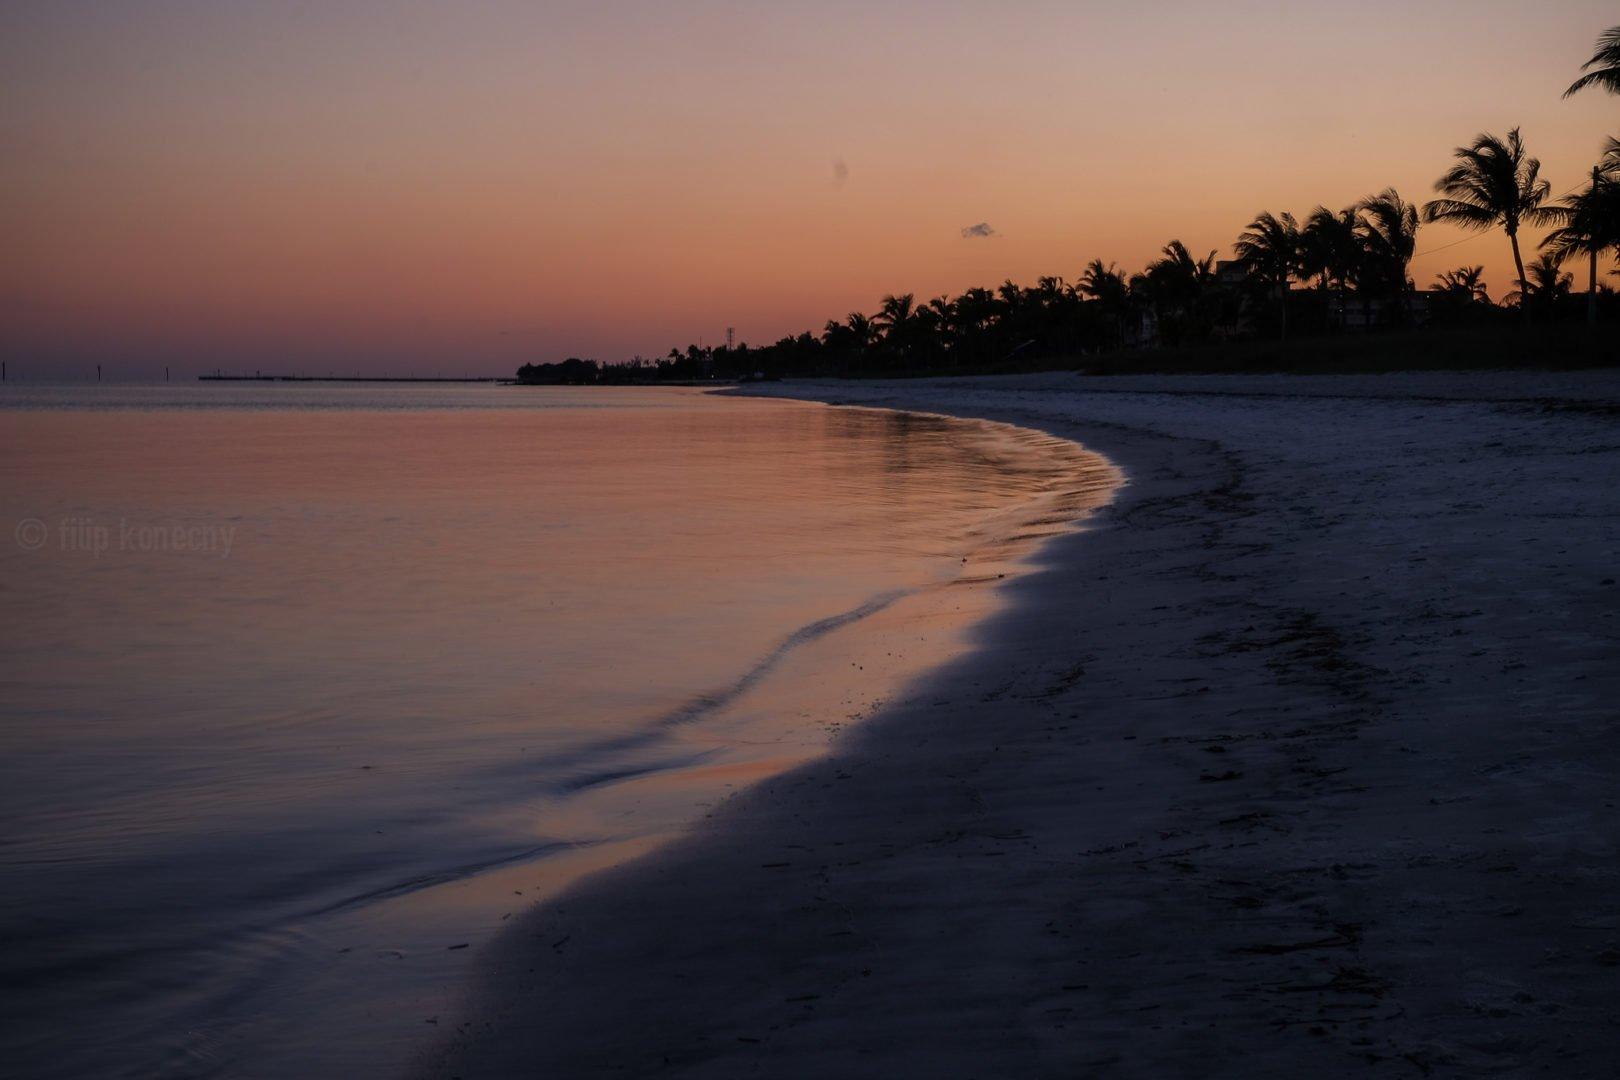 sunset on smathers beach